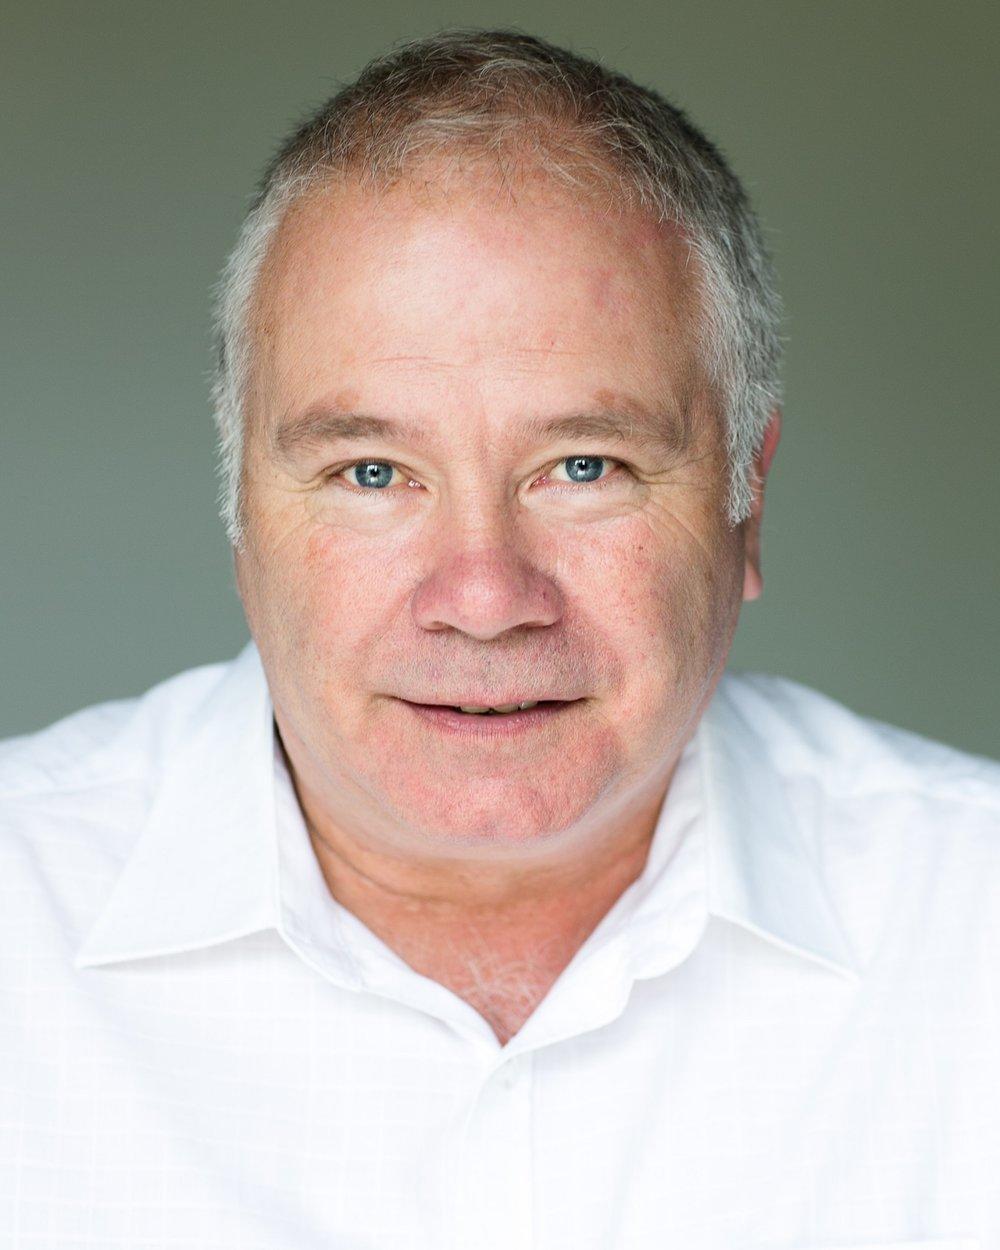 David Lonsdale